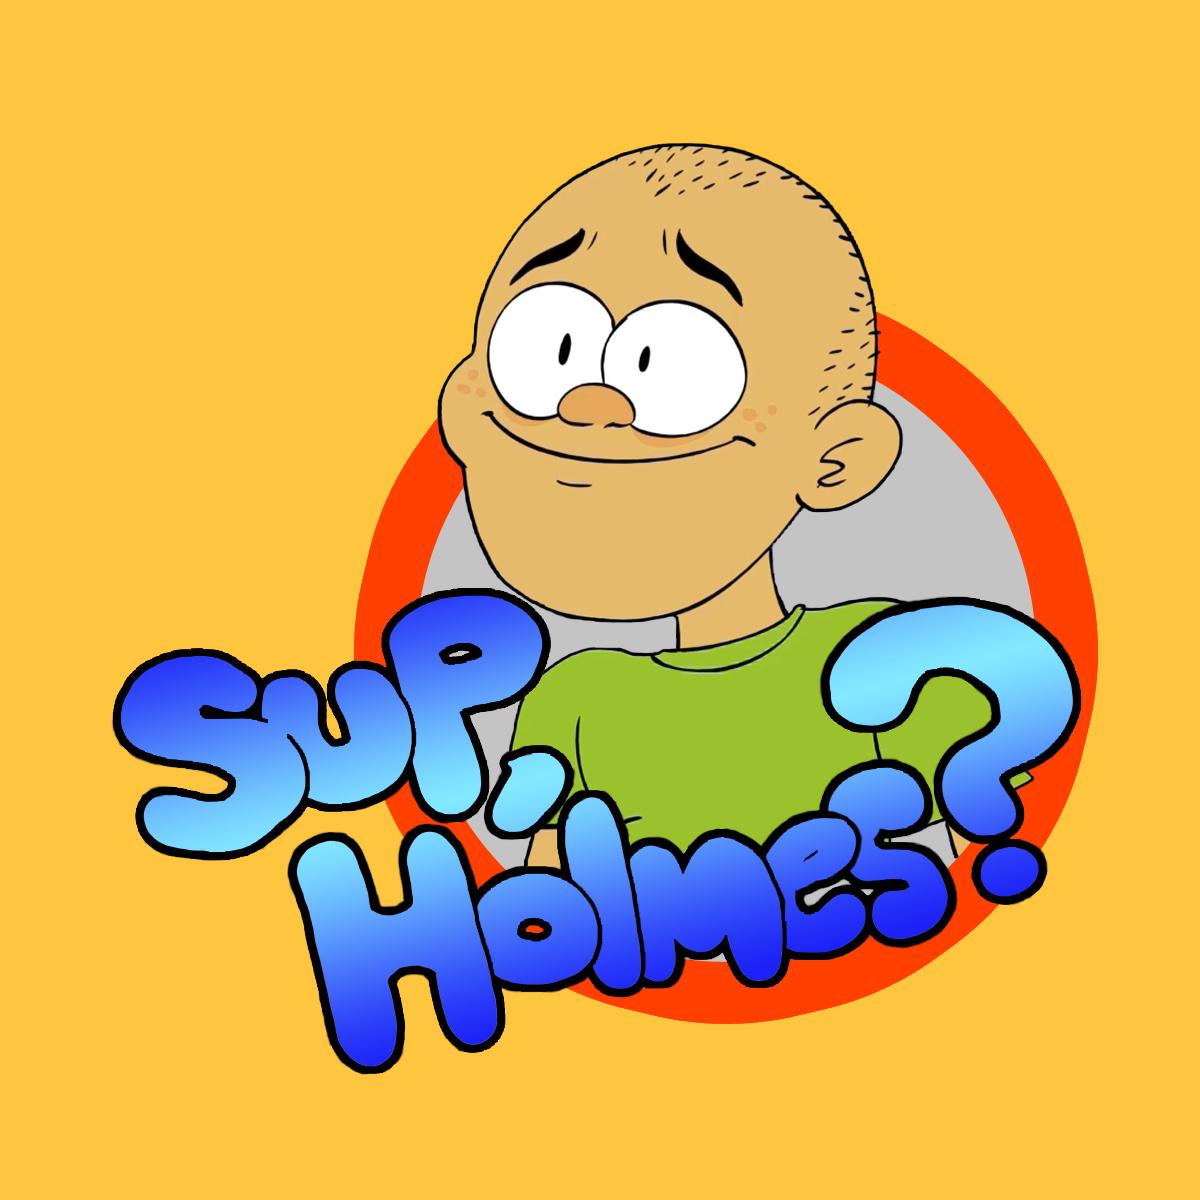 Sup, Holmes?